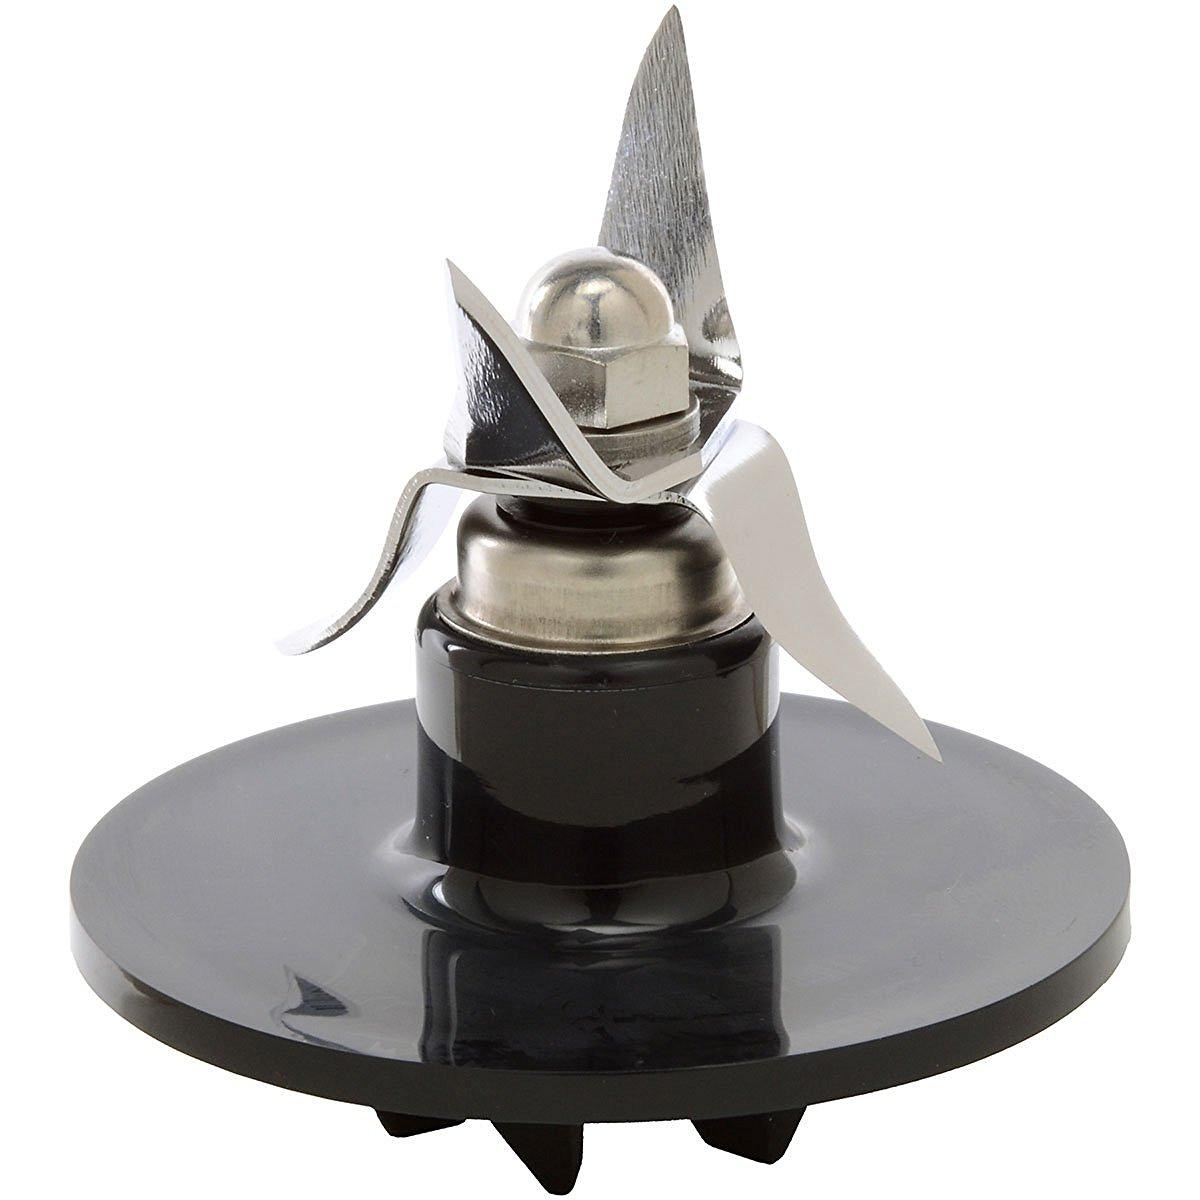 Cuisinart SPB-456-2B Blender Blade Black (Does not include gasket),Cuisinart